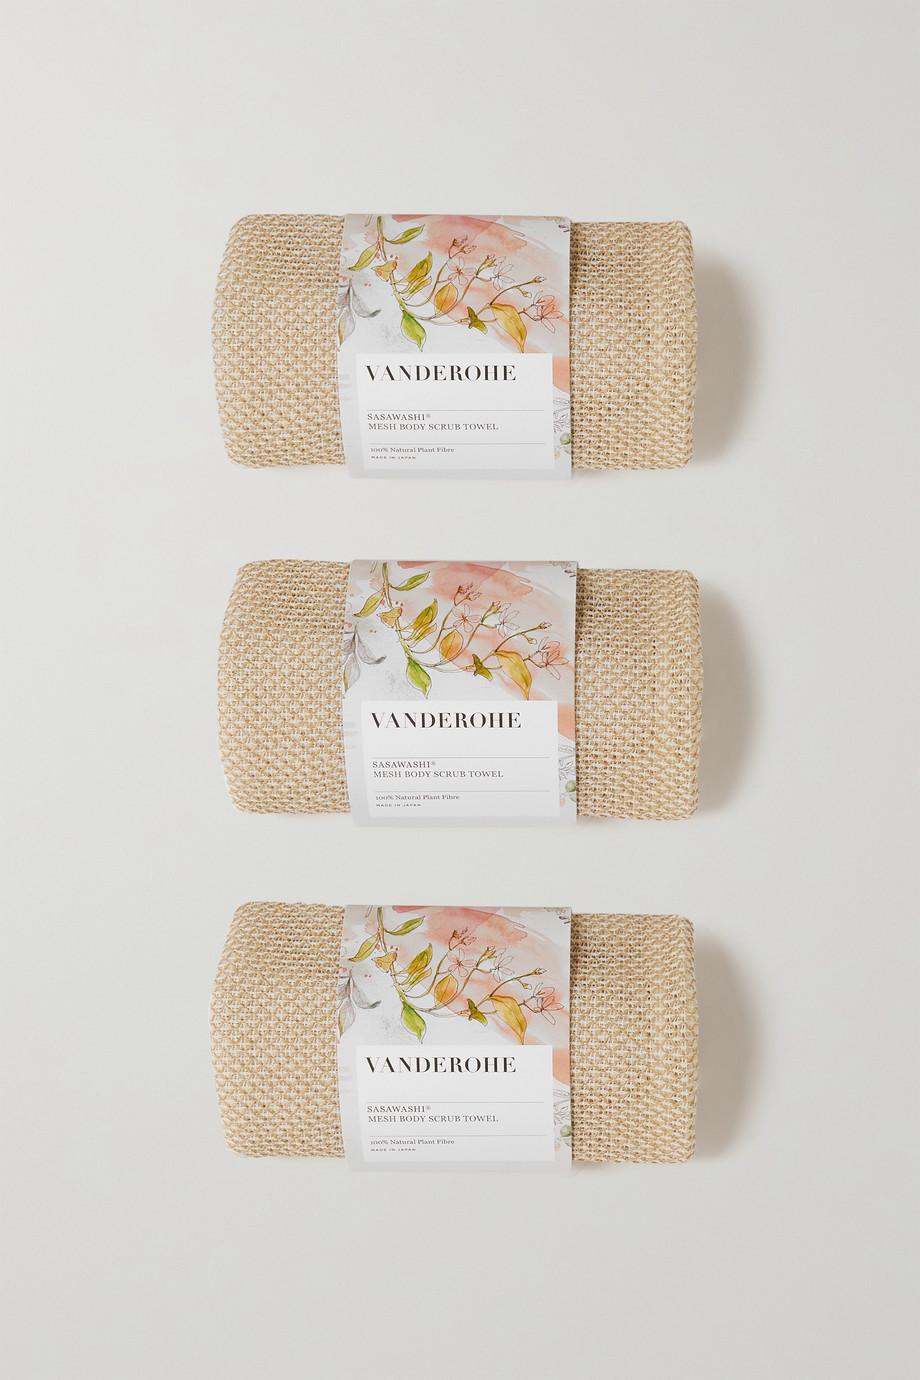 Vanderohe Sasawashi Mesh Body Scrub Towels – Set aus drei Peelingtüchern aus Netzmaterial für den Körper